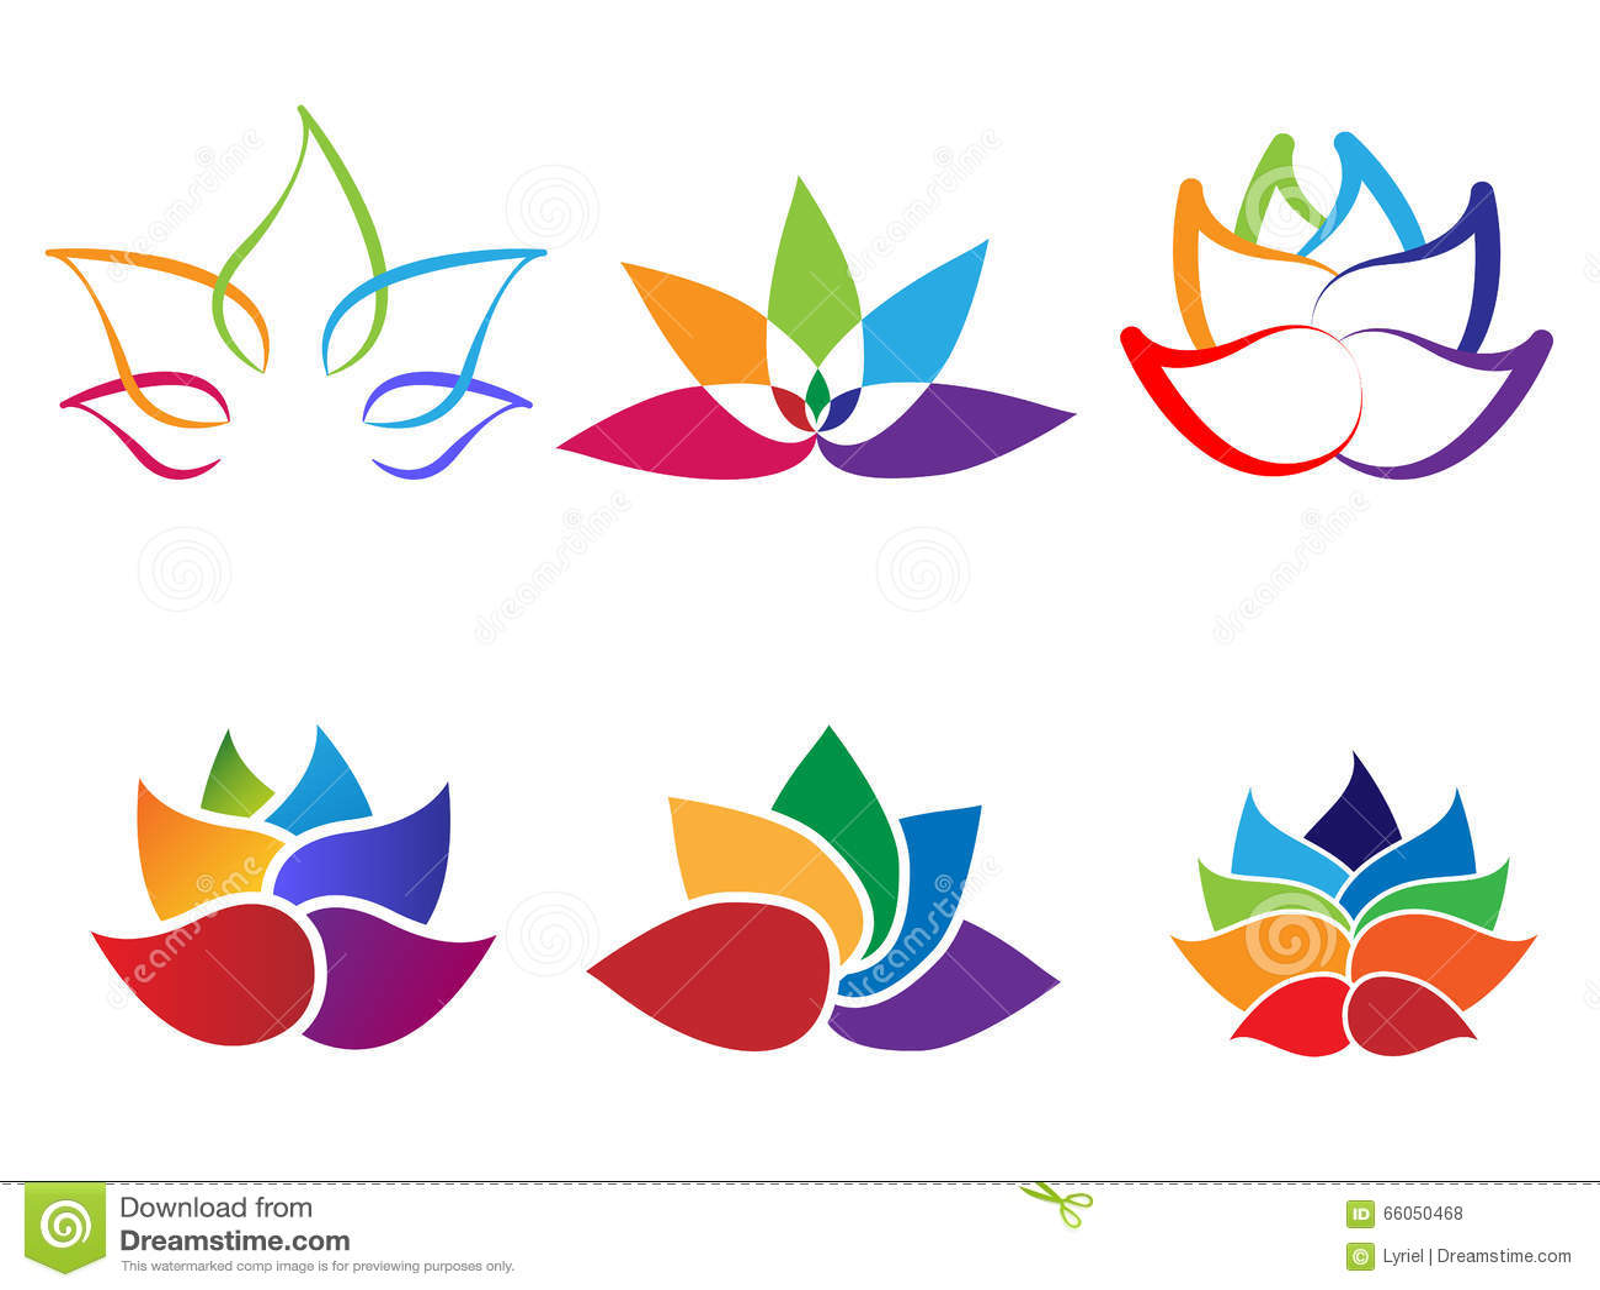 rainbow lotus flower abstract logo stock vector image